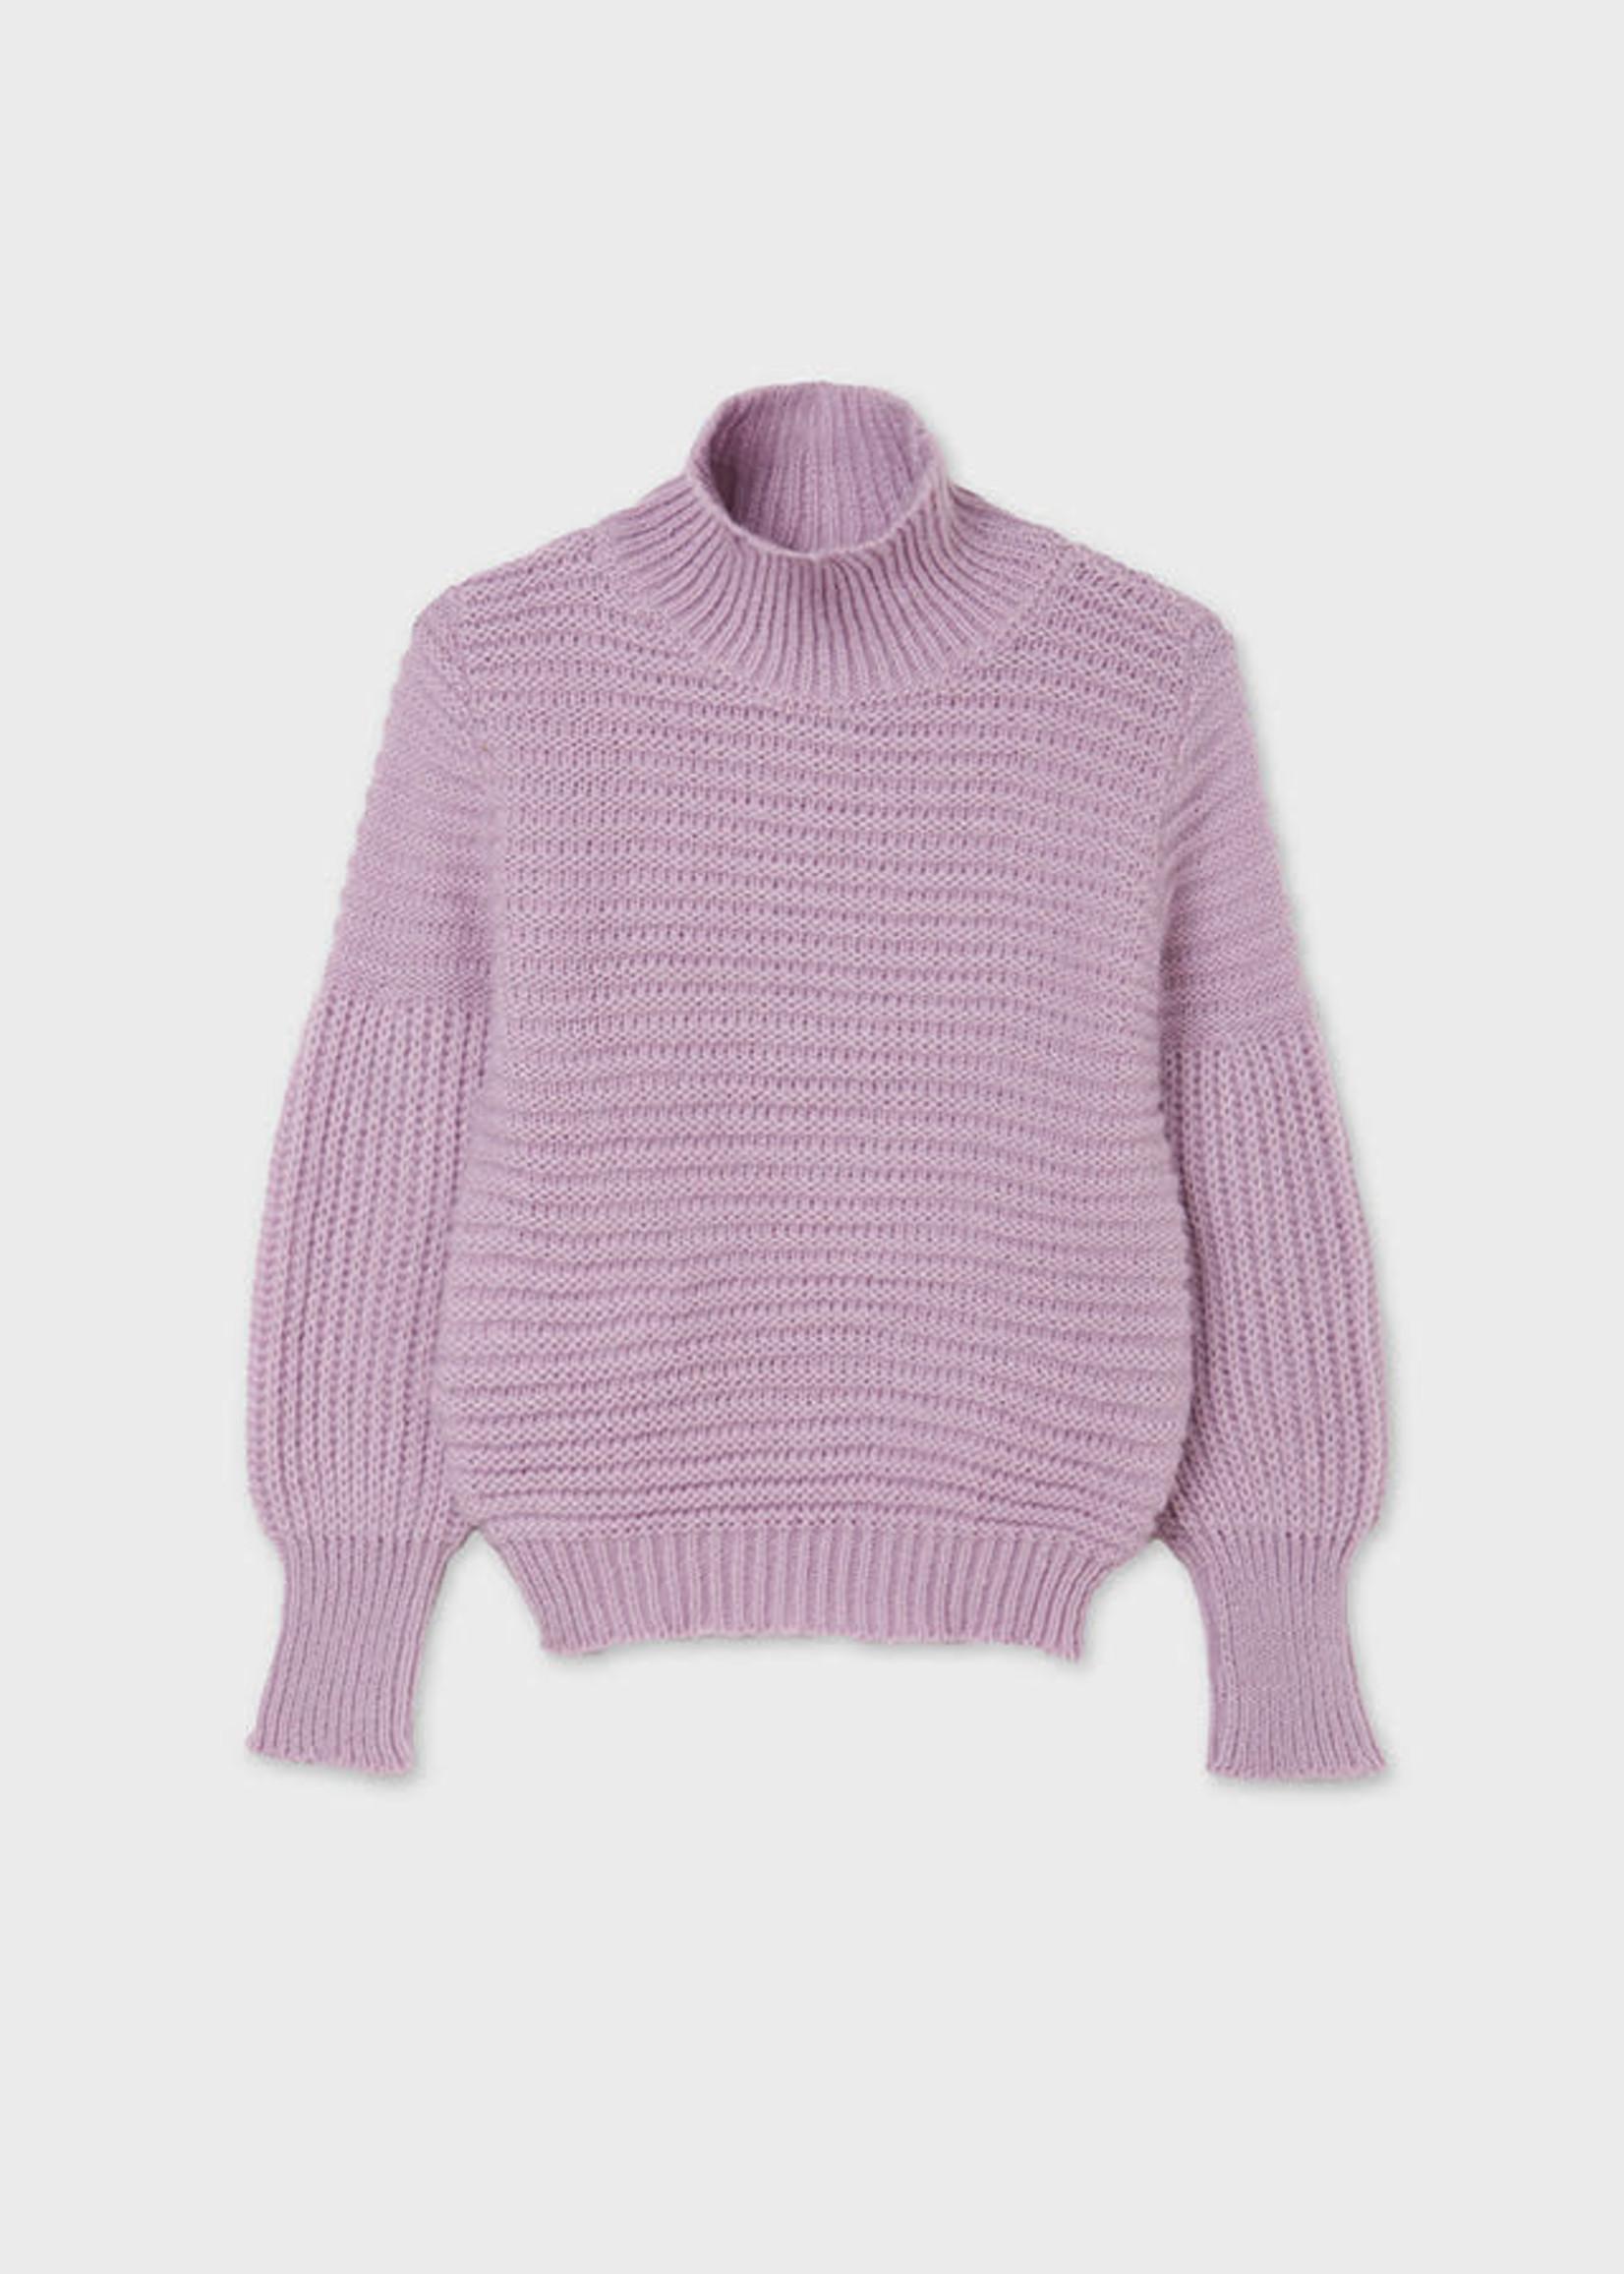 MAYORAL MAYORAL Sweater collar perkins lilac